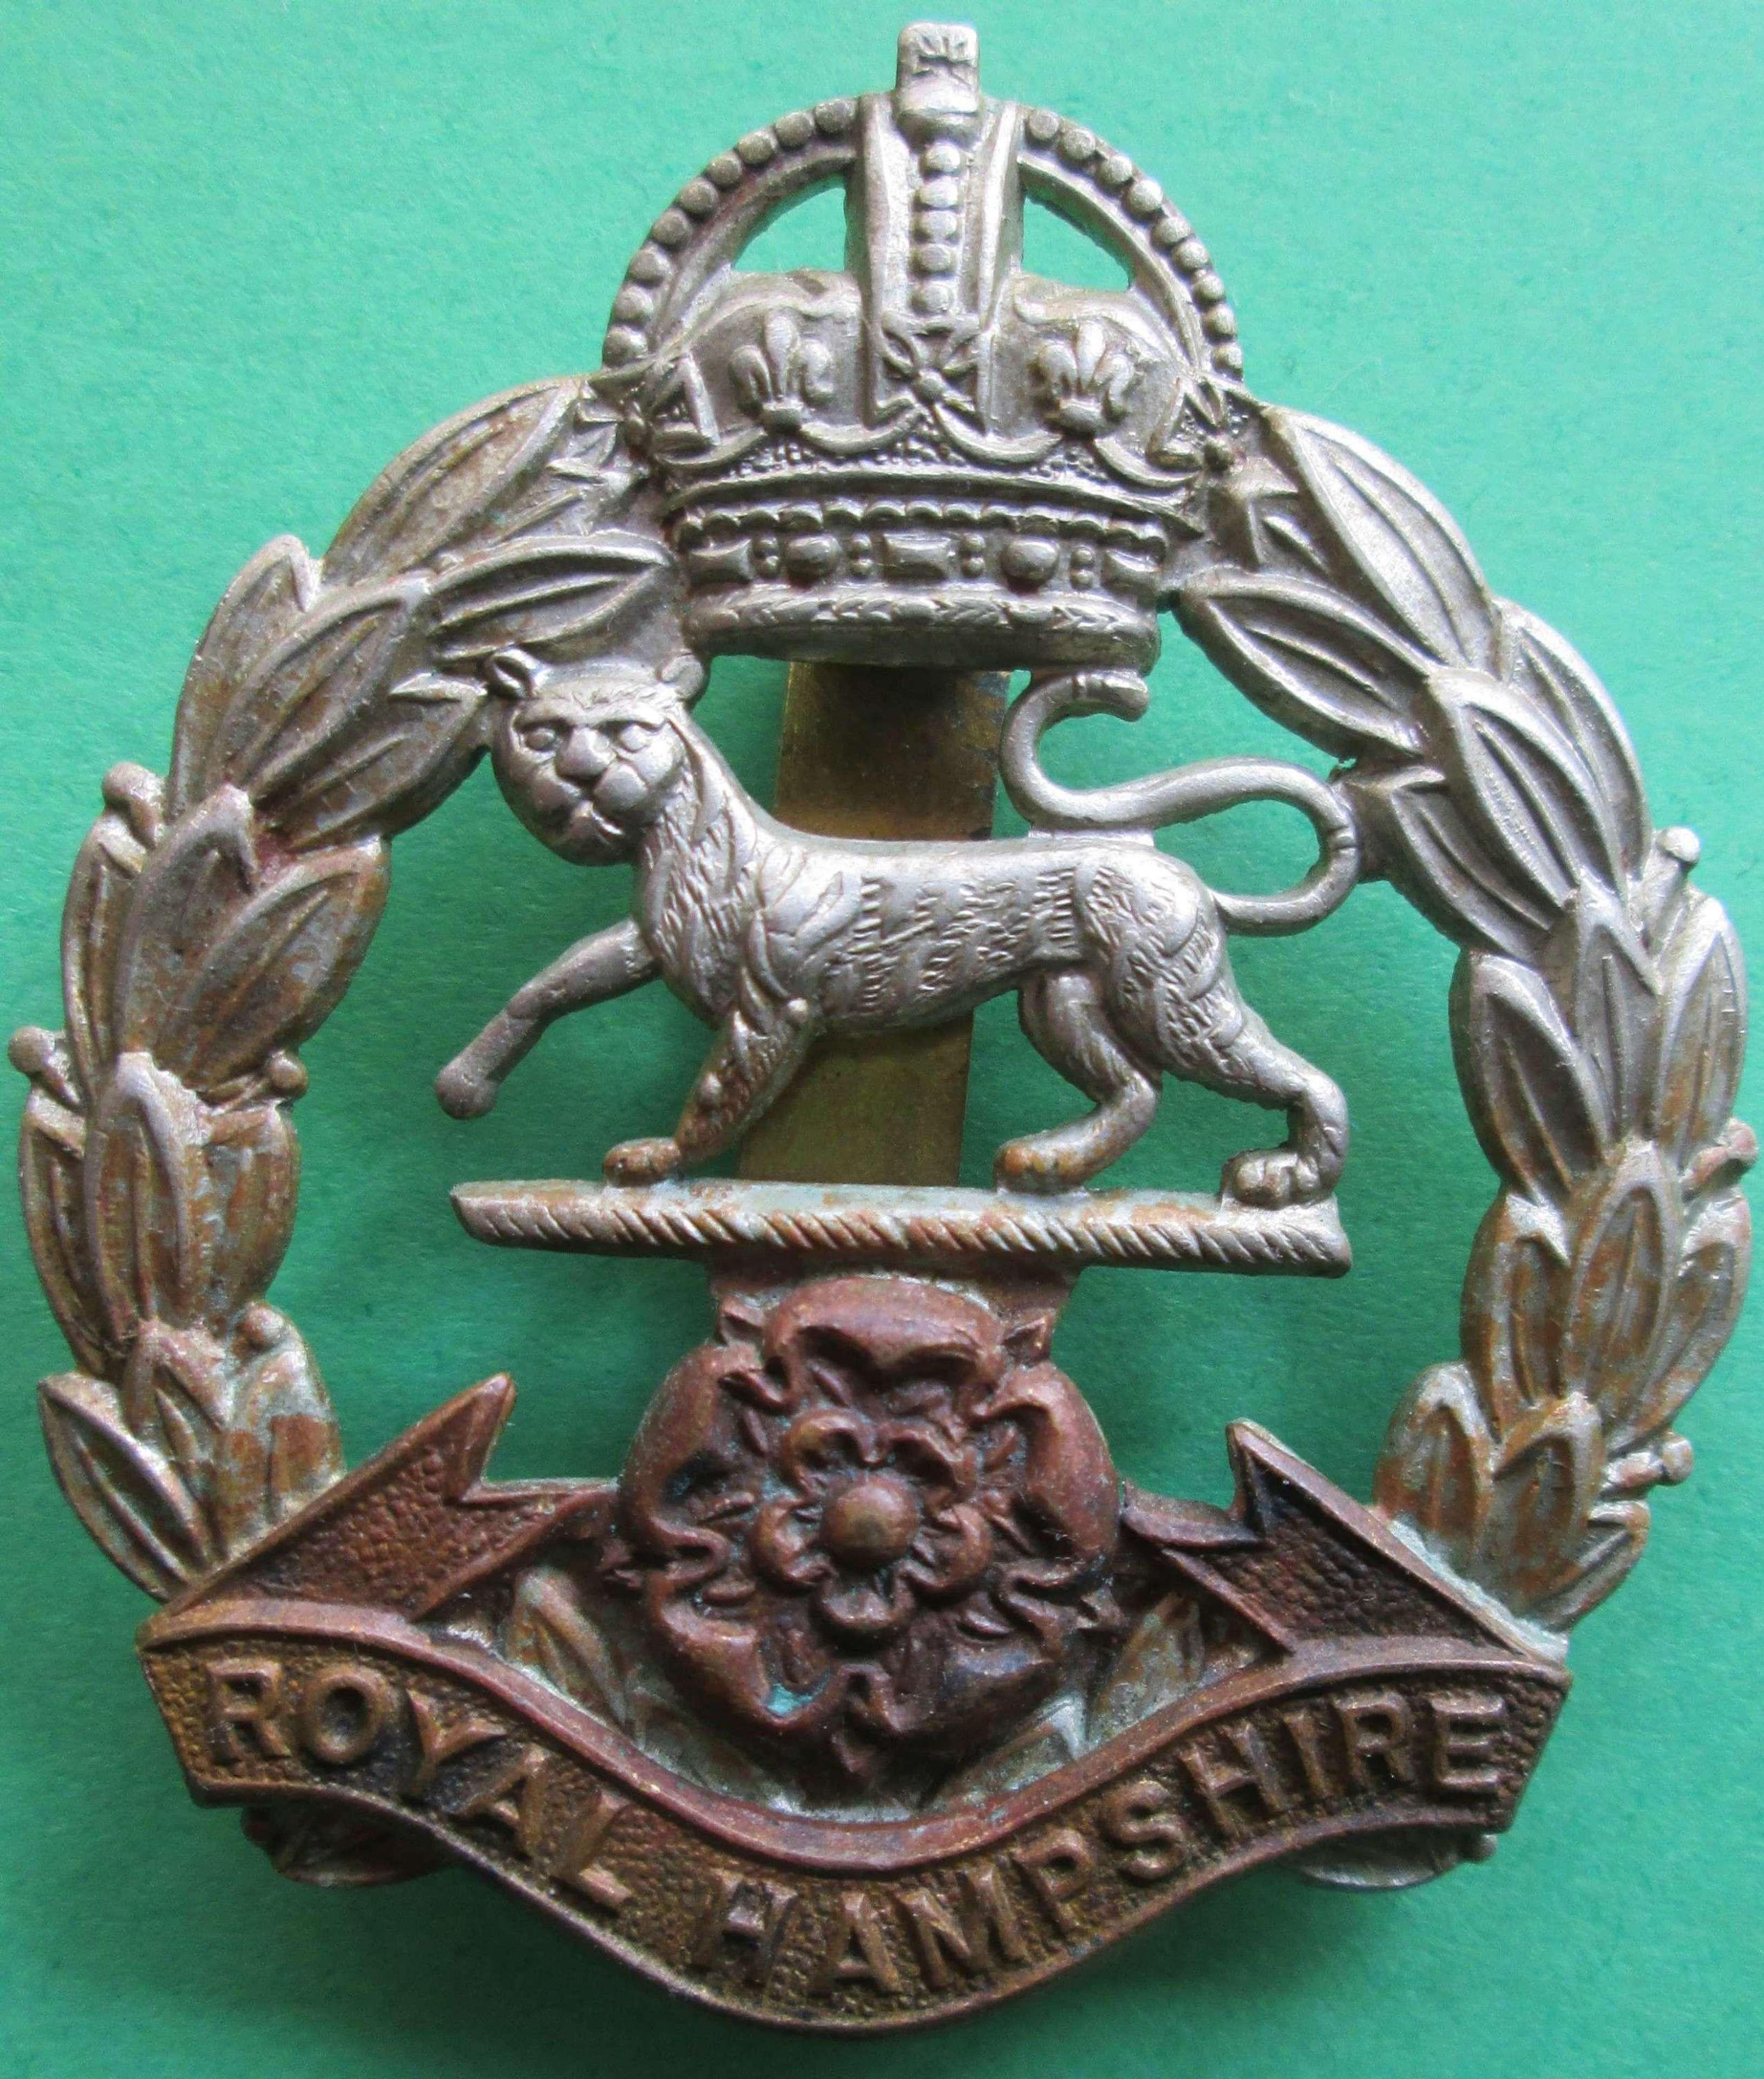 WWII ROYAL HAMPSHIRE REGIMENT CAP BADGE